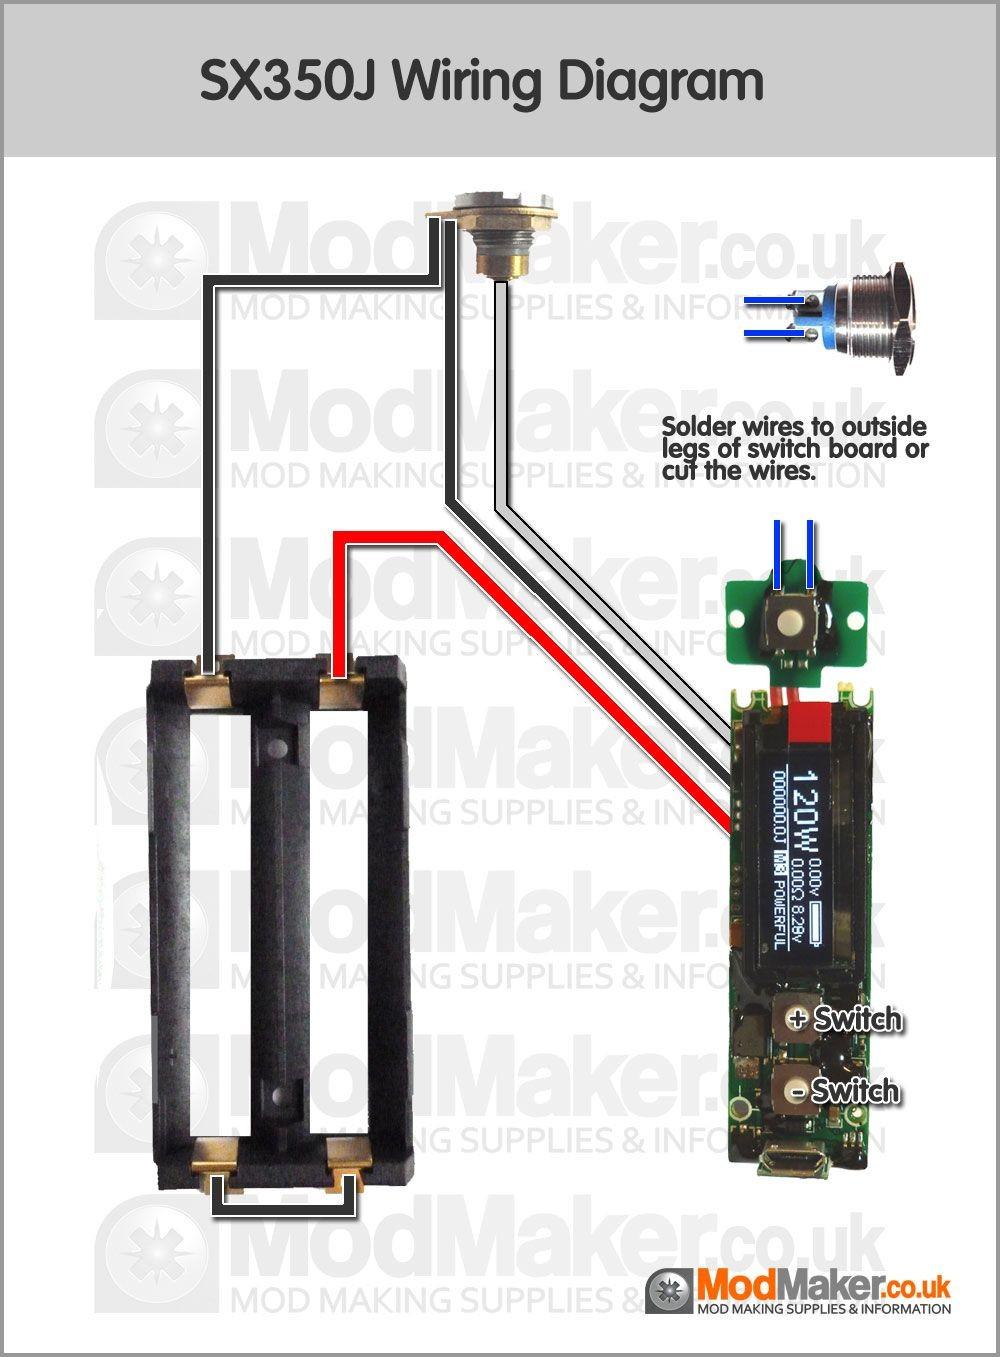 SX350J Wiring Diagram